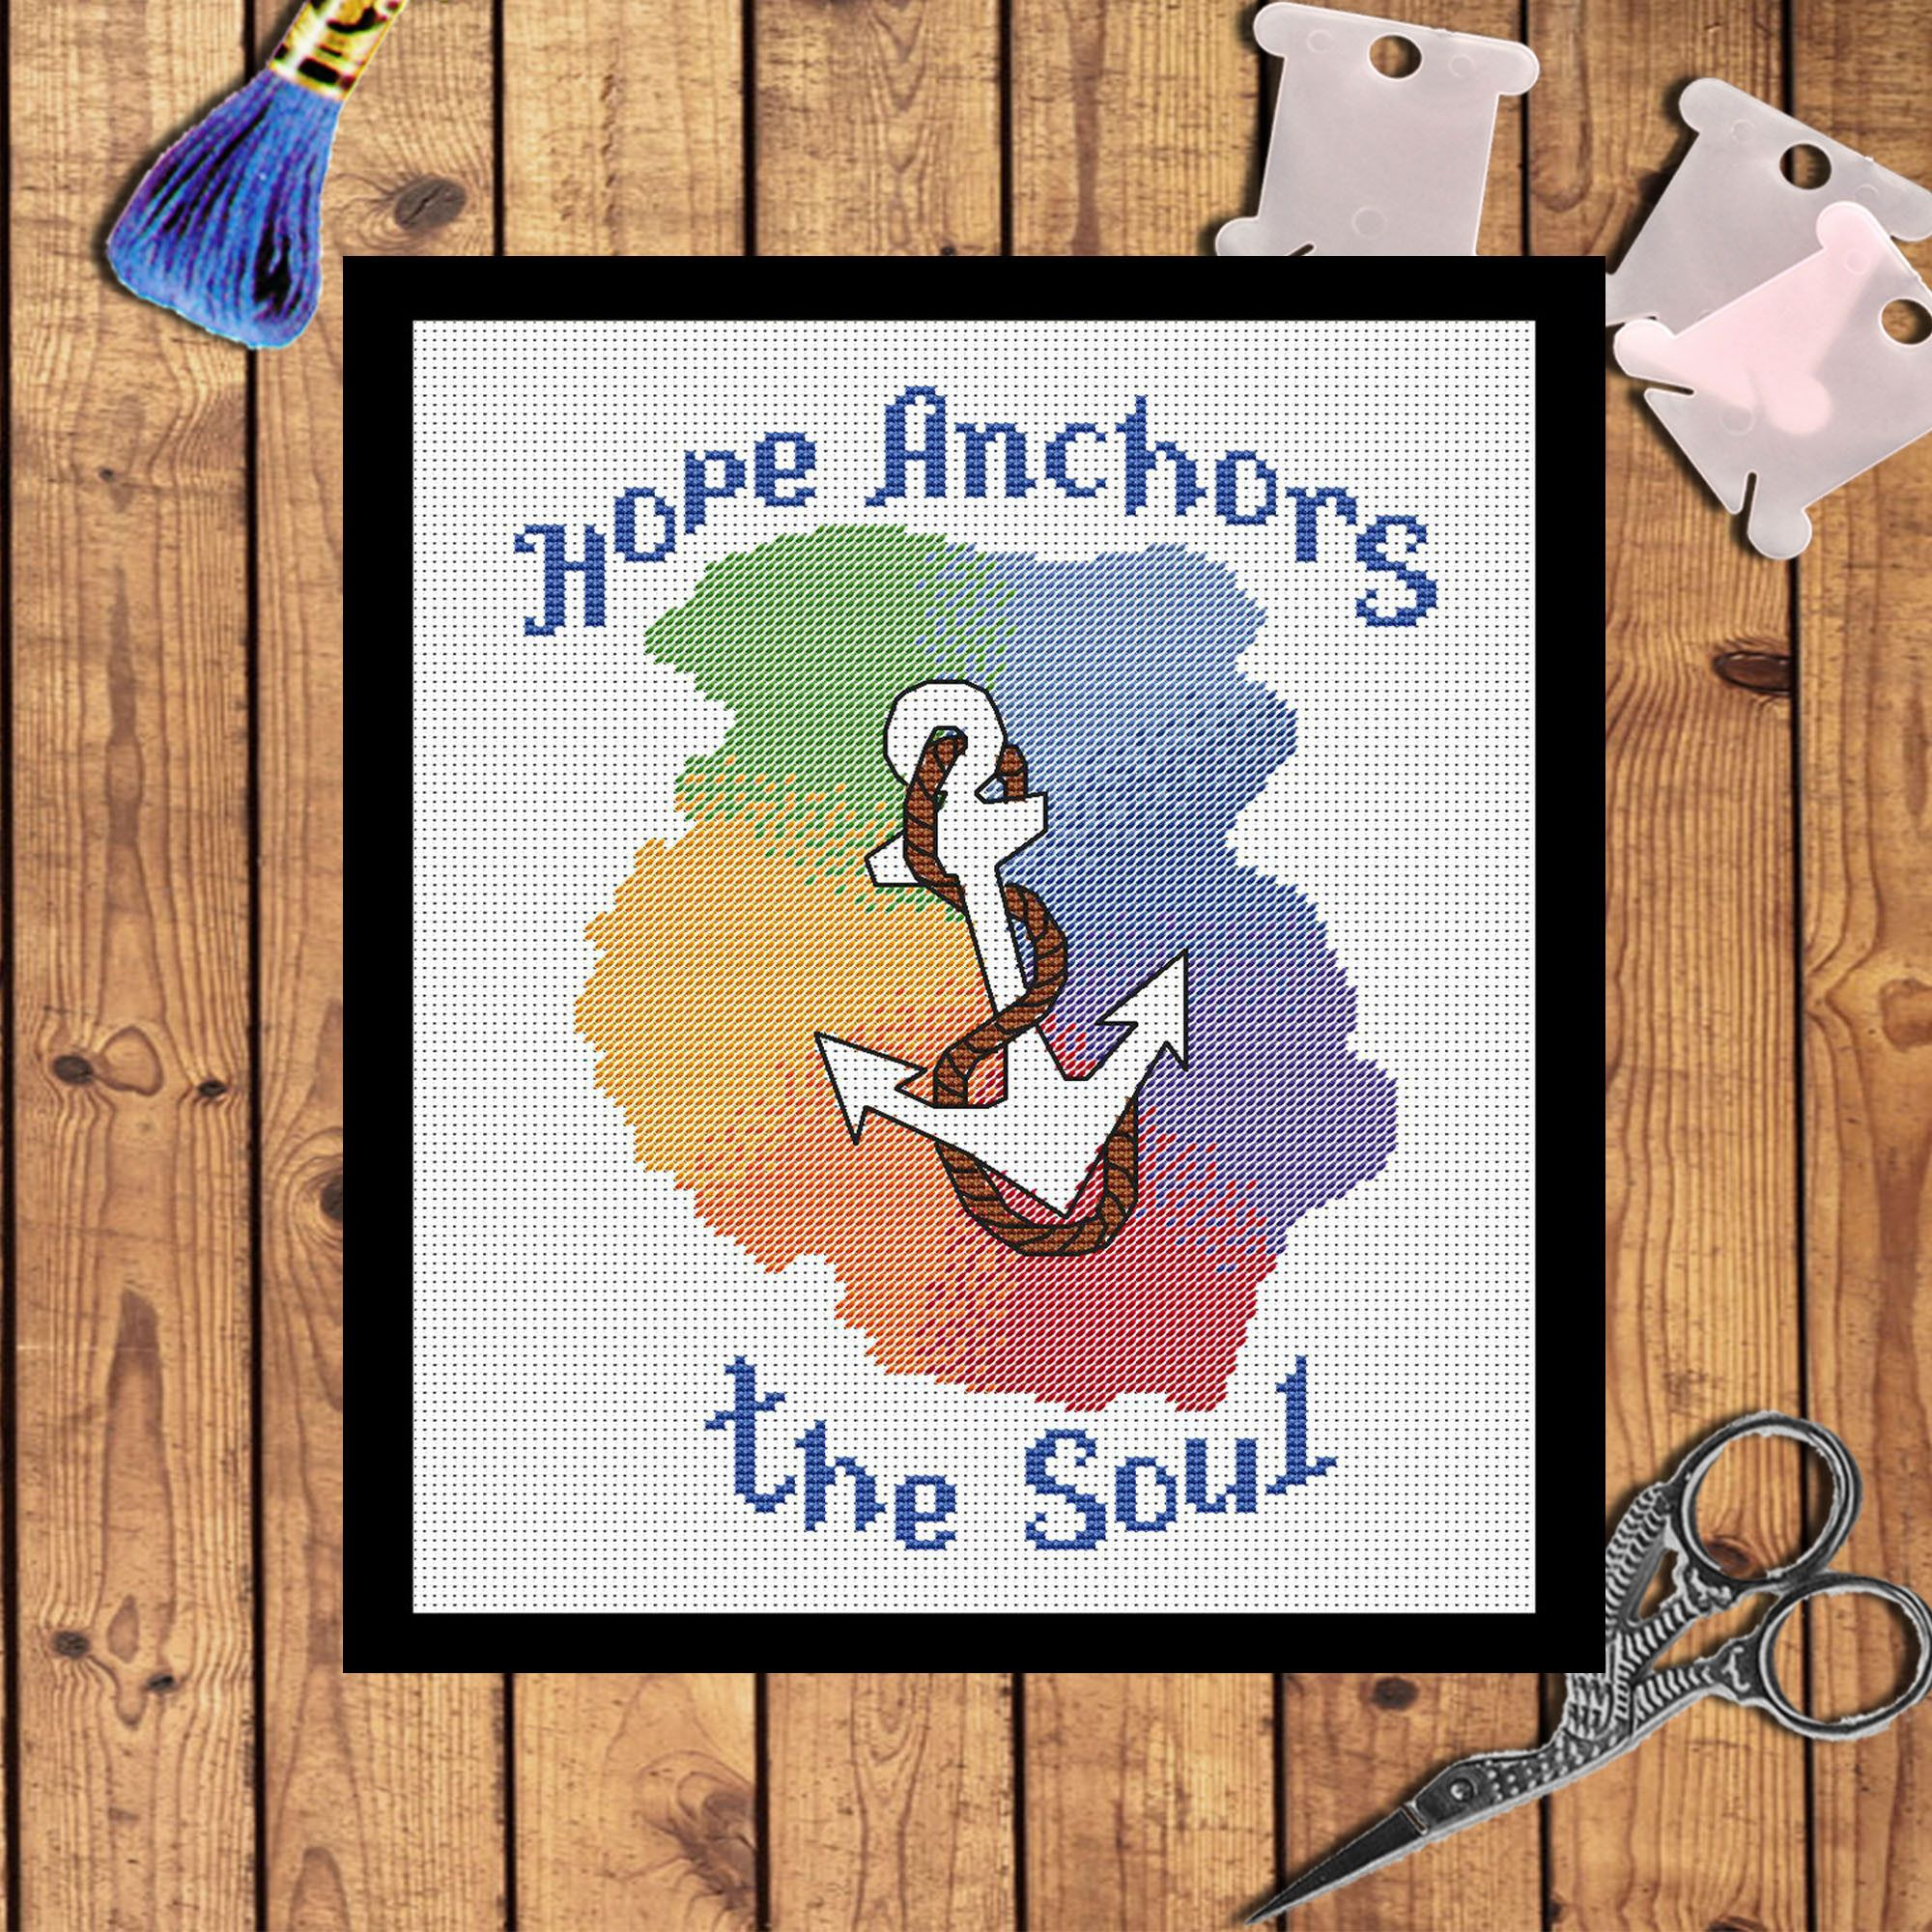 Anchor cross stitch pattern pdf nautical embroidery pattern sea anchor cross stitch pattern pdf nautical embroidery pattern sea life ocean sailing gift nautical gift decor bankloansurffo Gallery